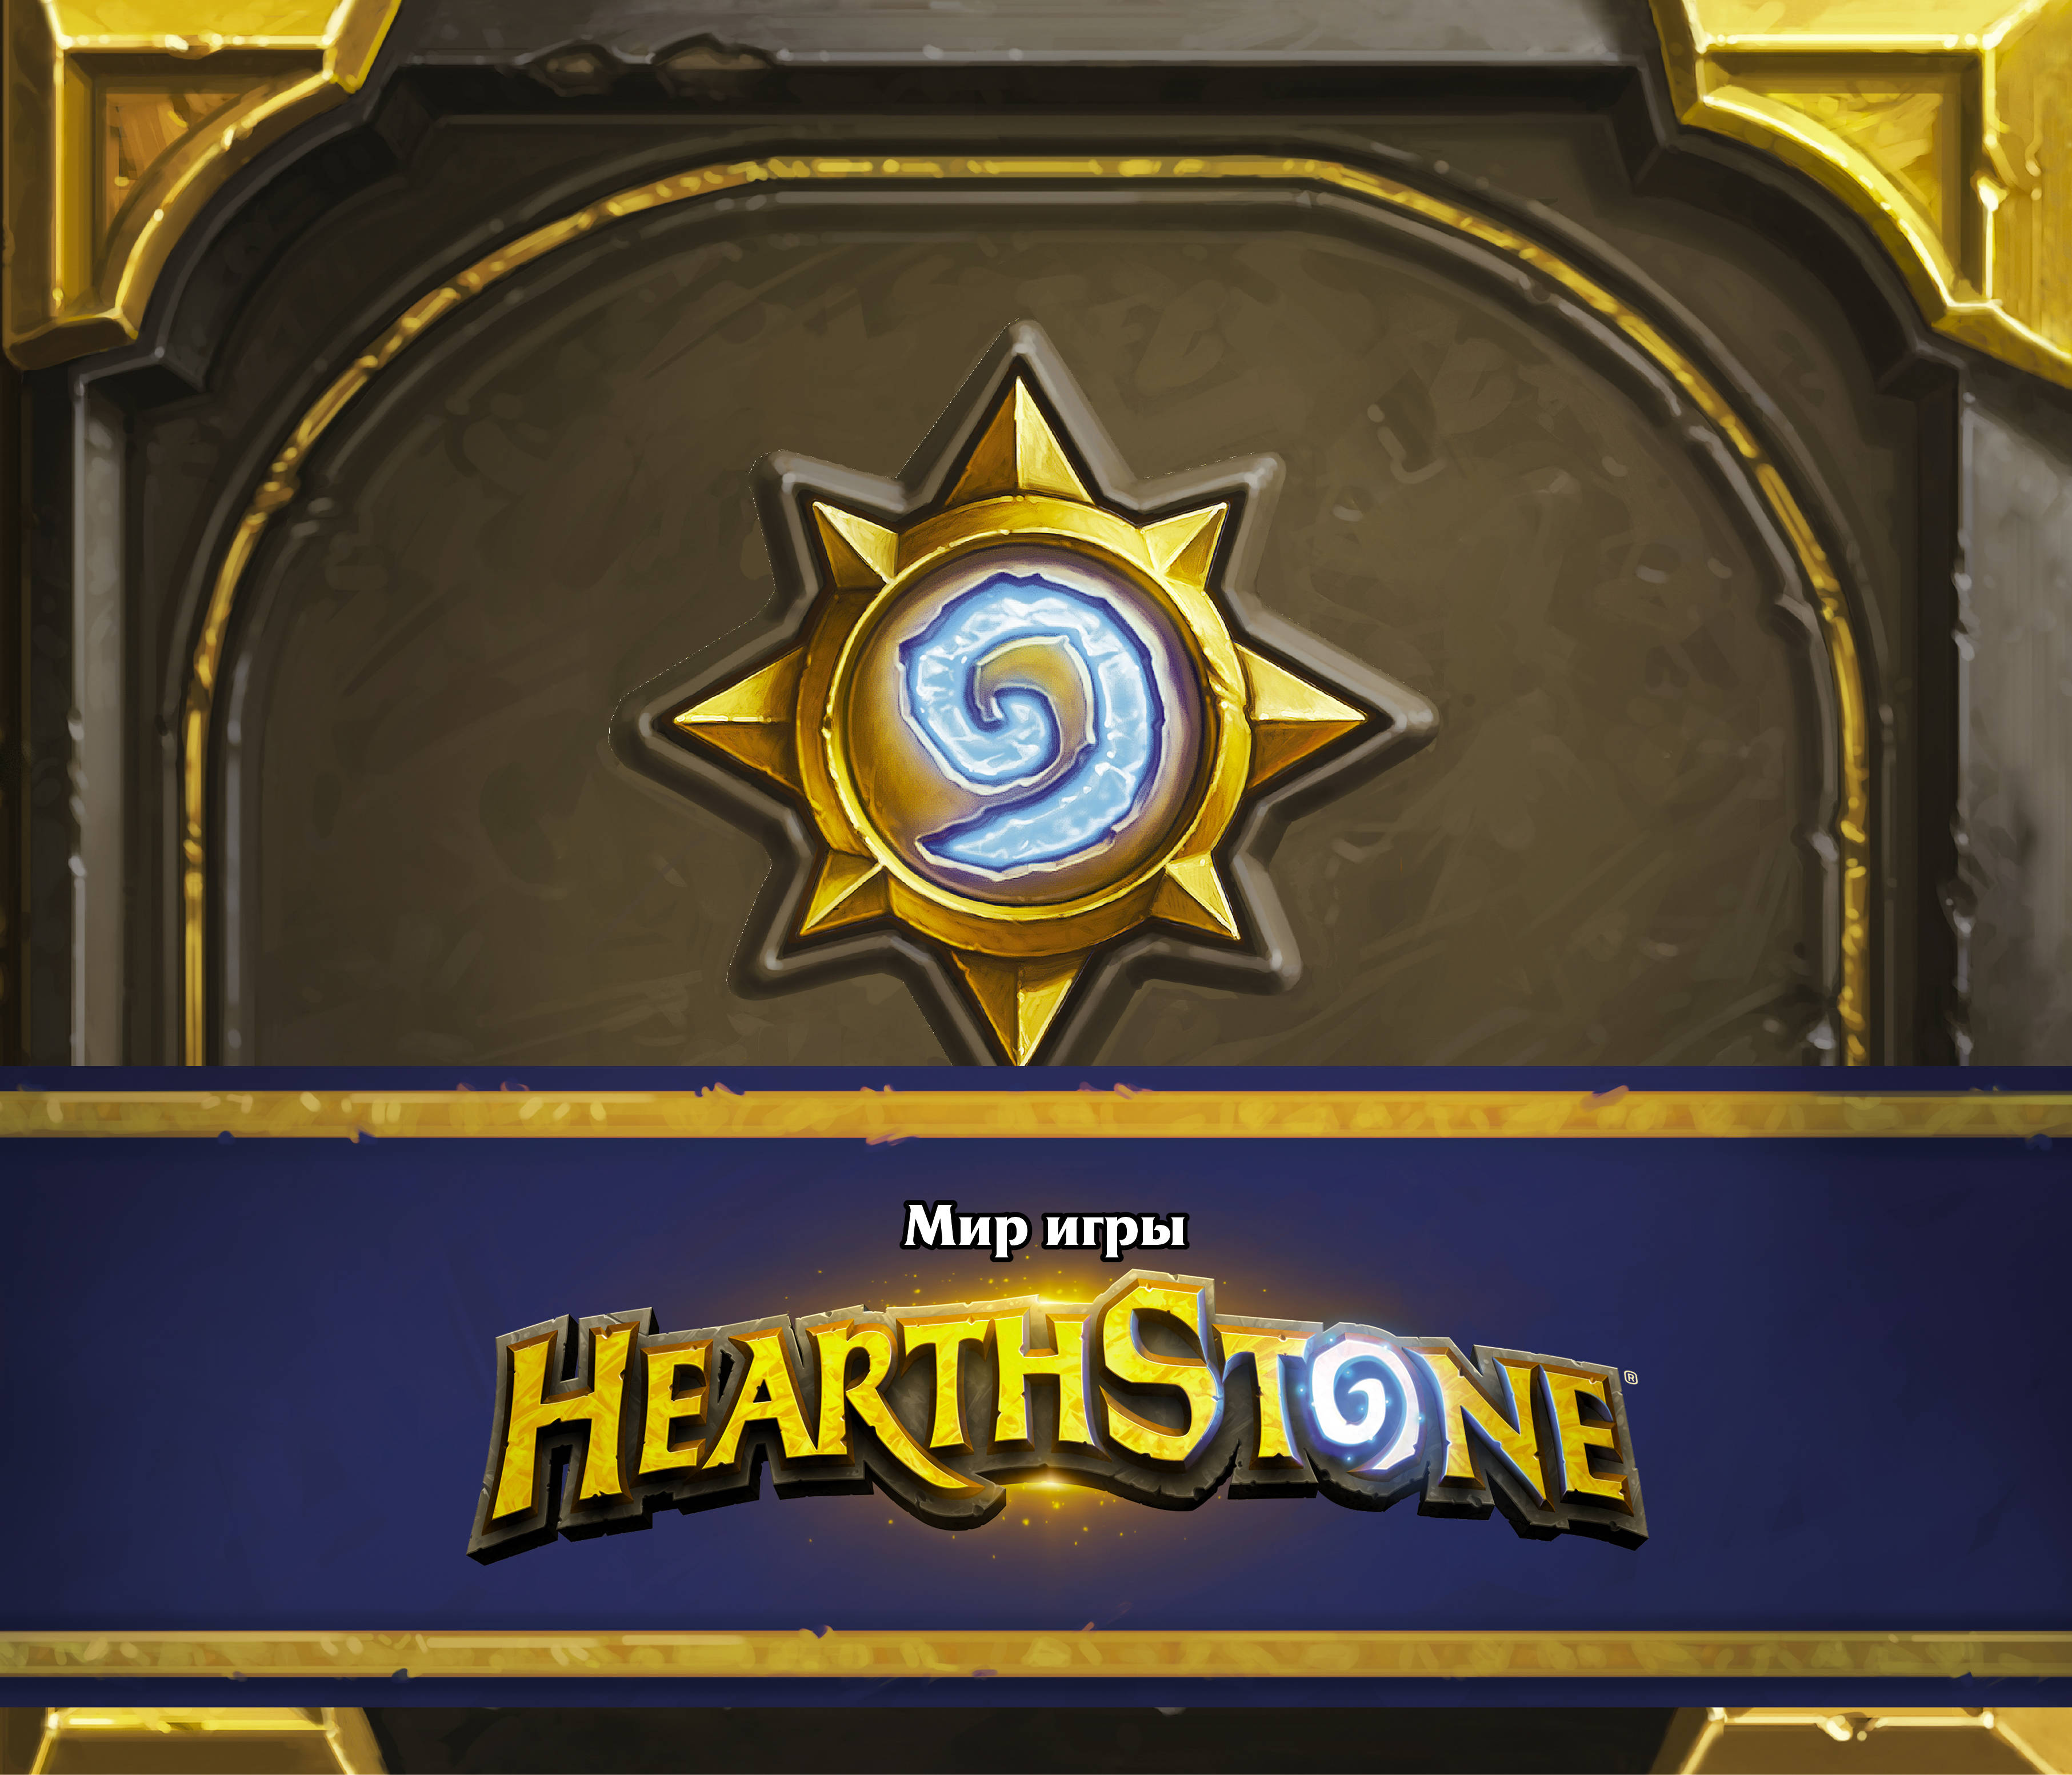 Mir igry Hearthstone